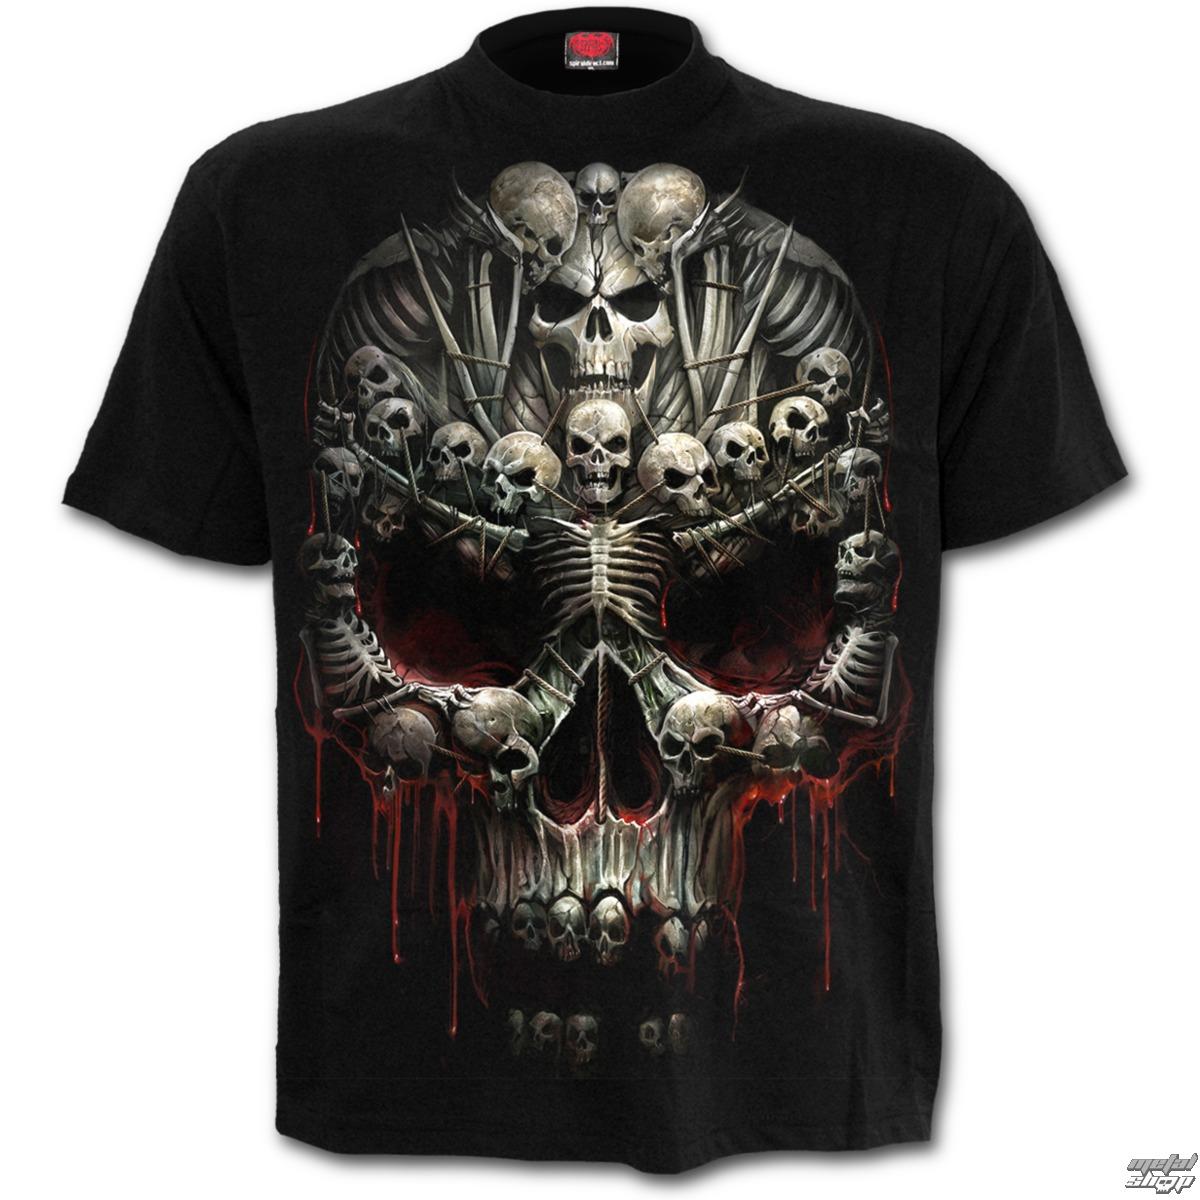 tričko pánské SPIRAL - Death Bones - Black - T126M101